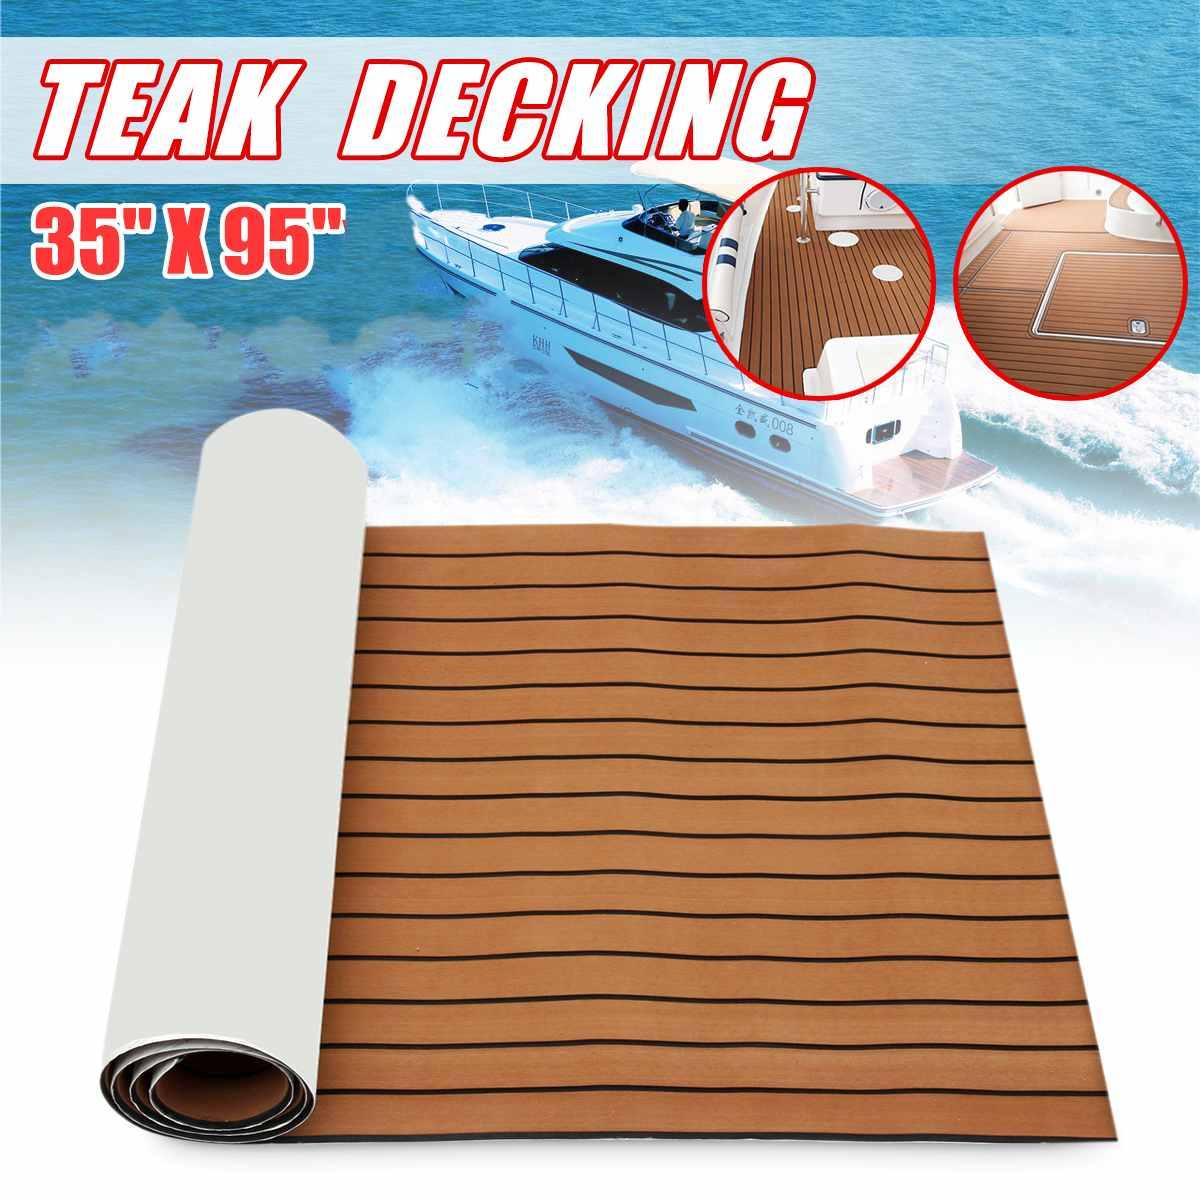 Self-Adhesive 2400x900x5.5mm Marine Boat Synthetic Flooring EVA Foam Yacht Teak Decking Sheet Car Carpet Floor MatSelf-Adhesive 2400x900x5.5mm Marine Boat Synthetic Flooring EVA Foam Yacht Teak Decking Sheet Car Carpet Floor Mat